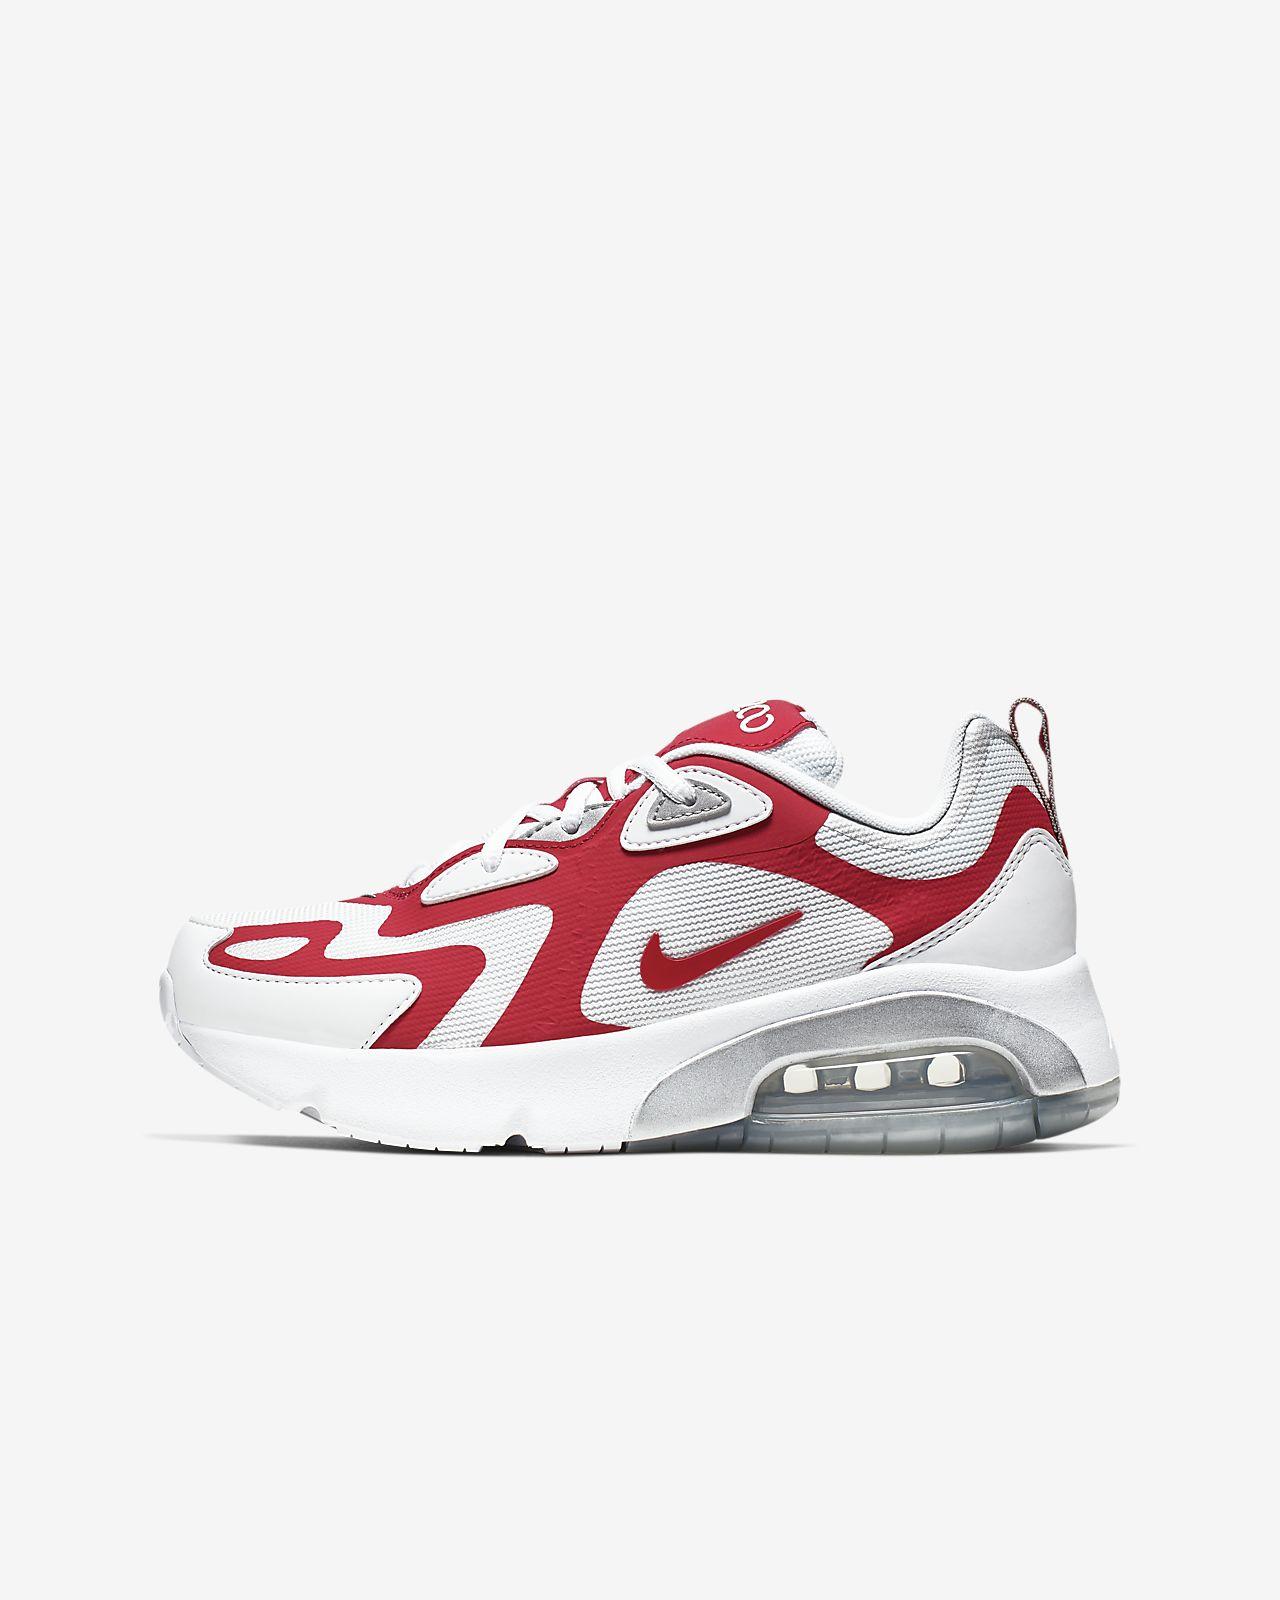 Sko Nike Air Max 200 för ungdom